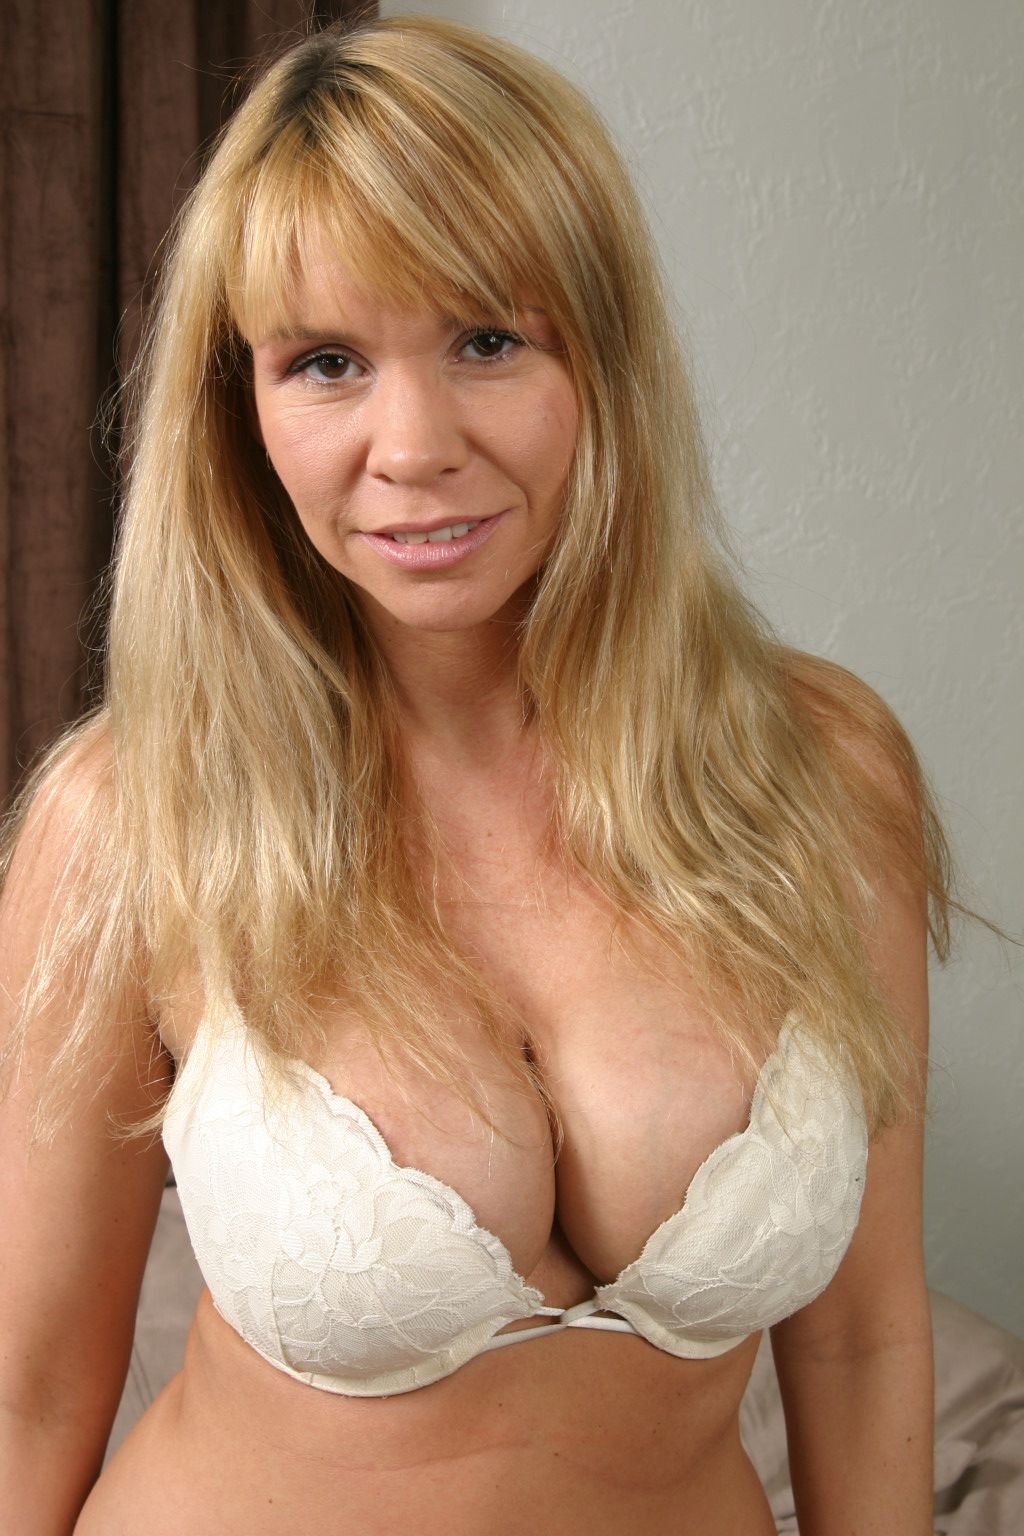 Sexy Busty Mom Domymom